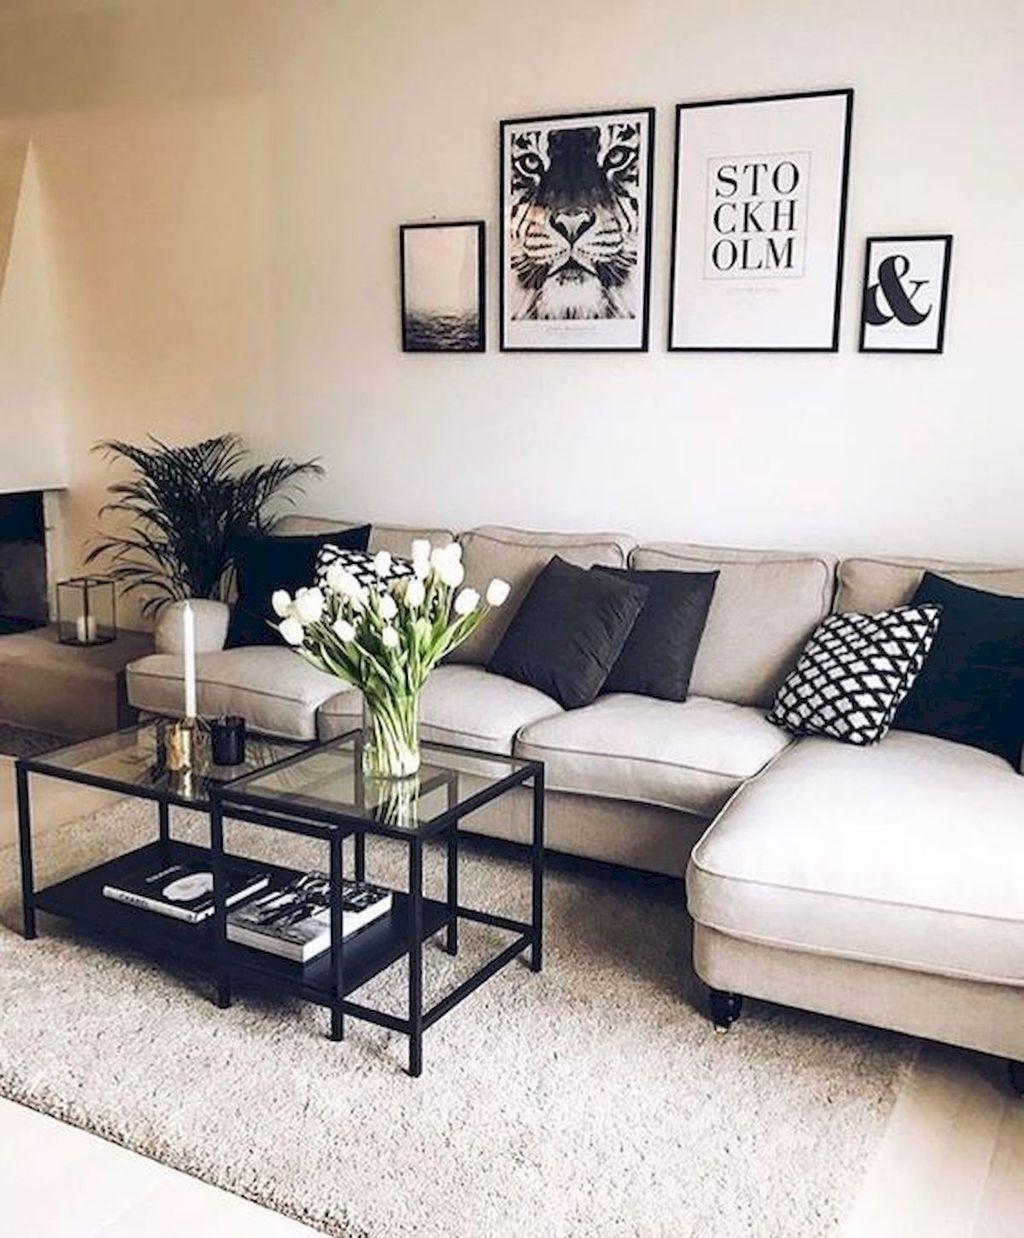 41 Fabulous Living Room Decor Ideas Decoratingideashome Fabulous Living Room Decor Living Room Decor Apartment Farm House Living Room